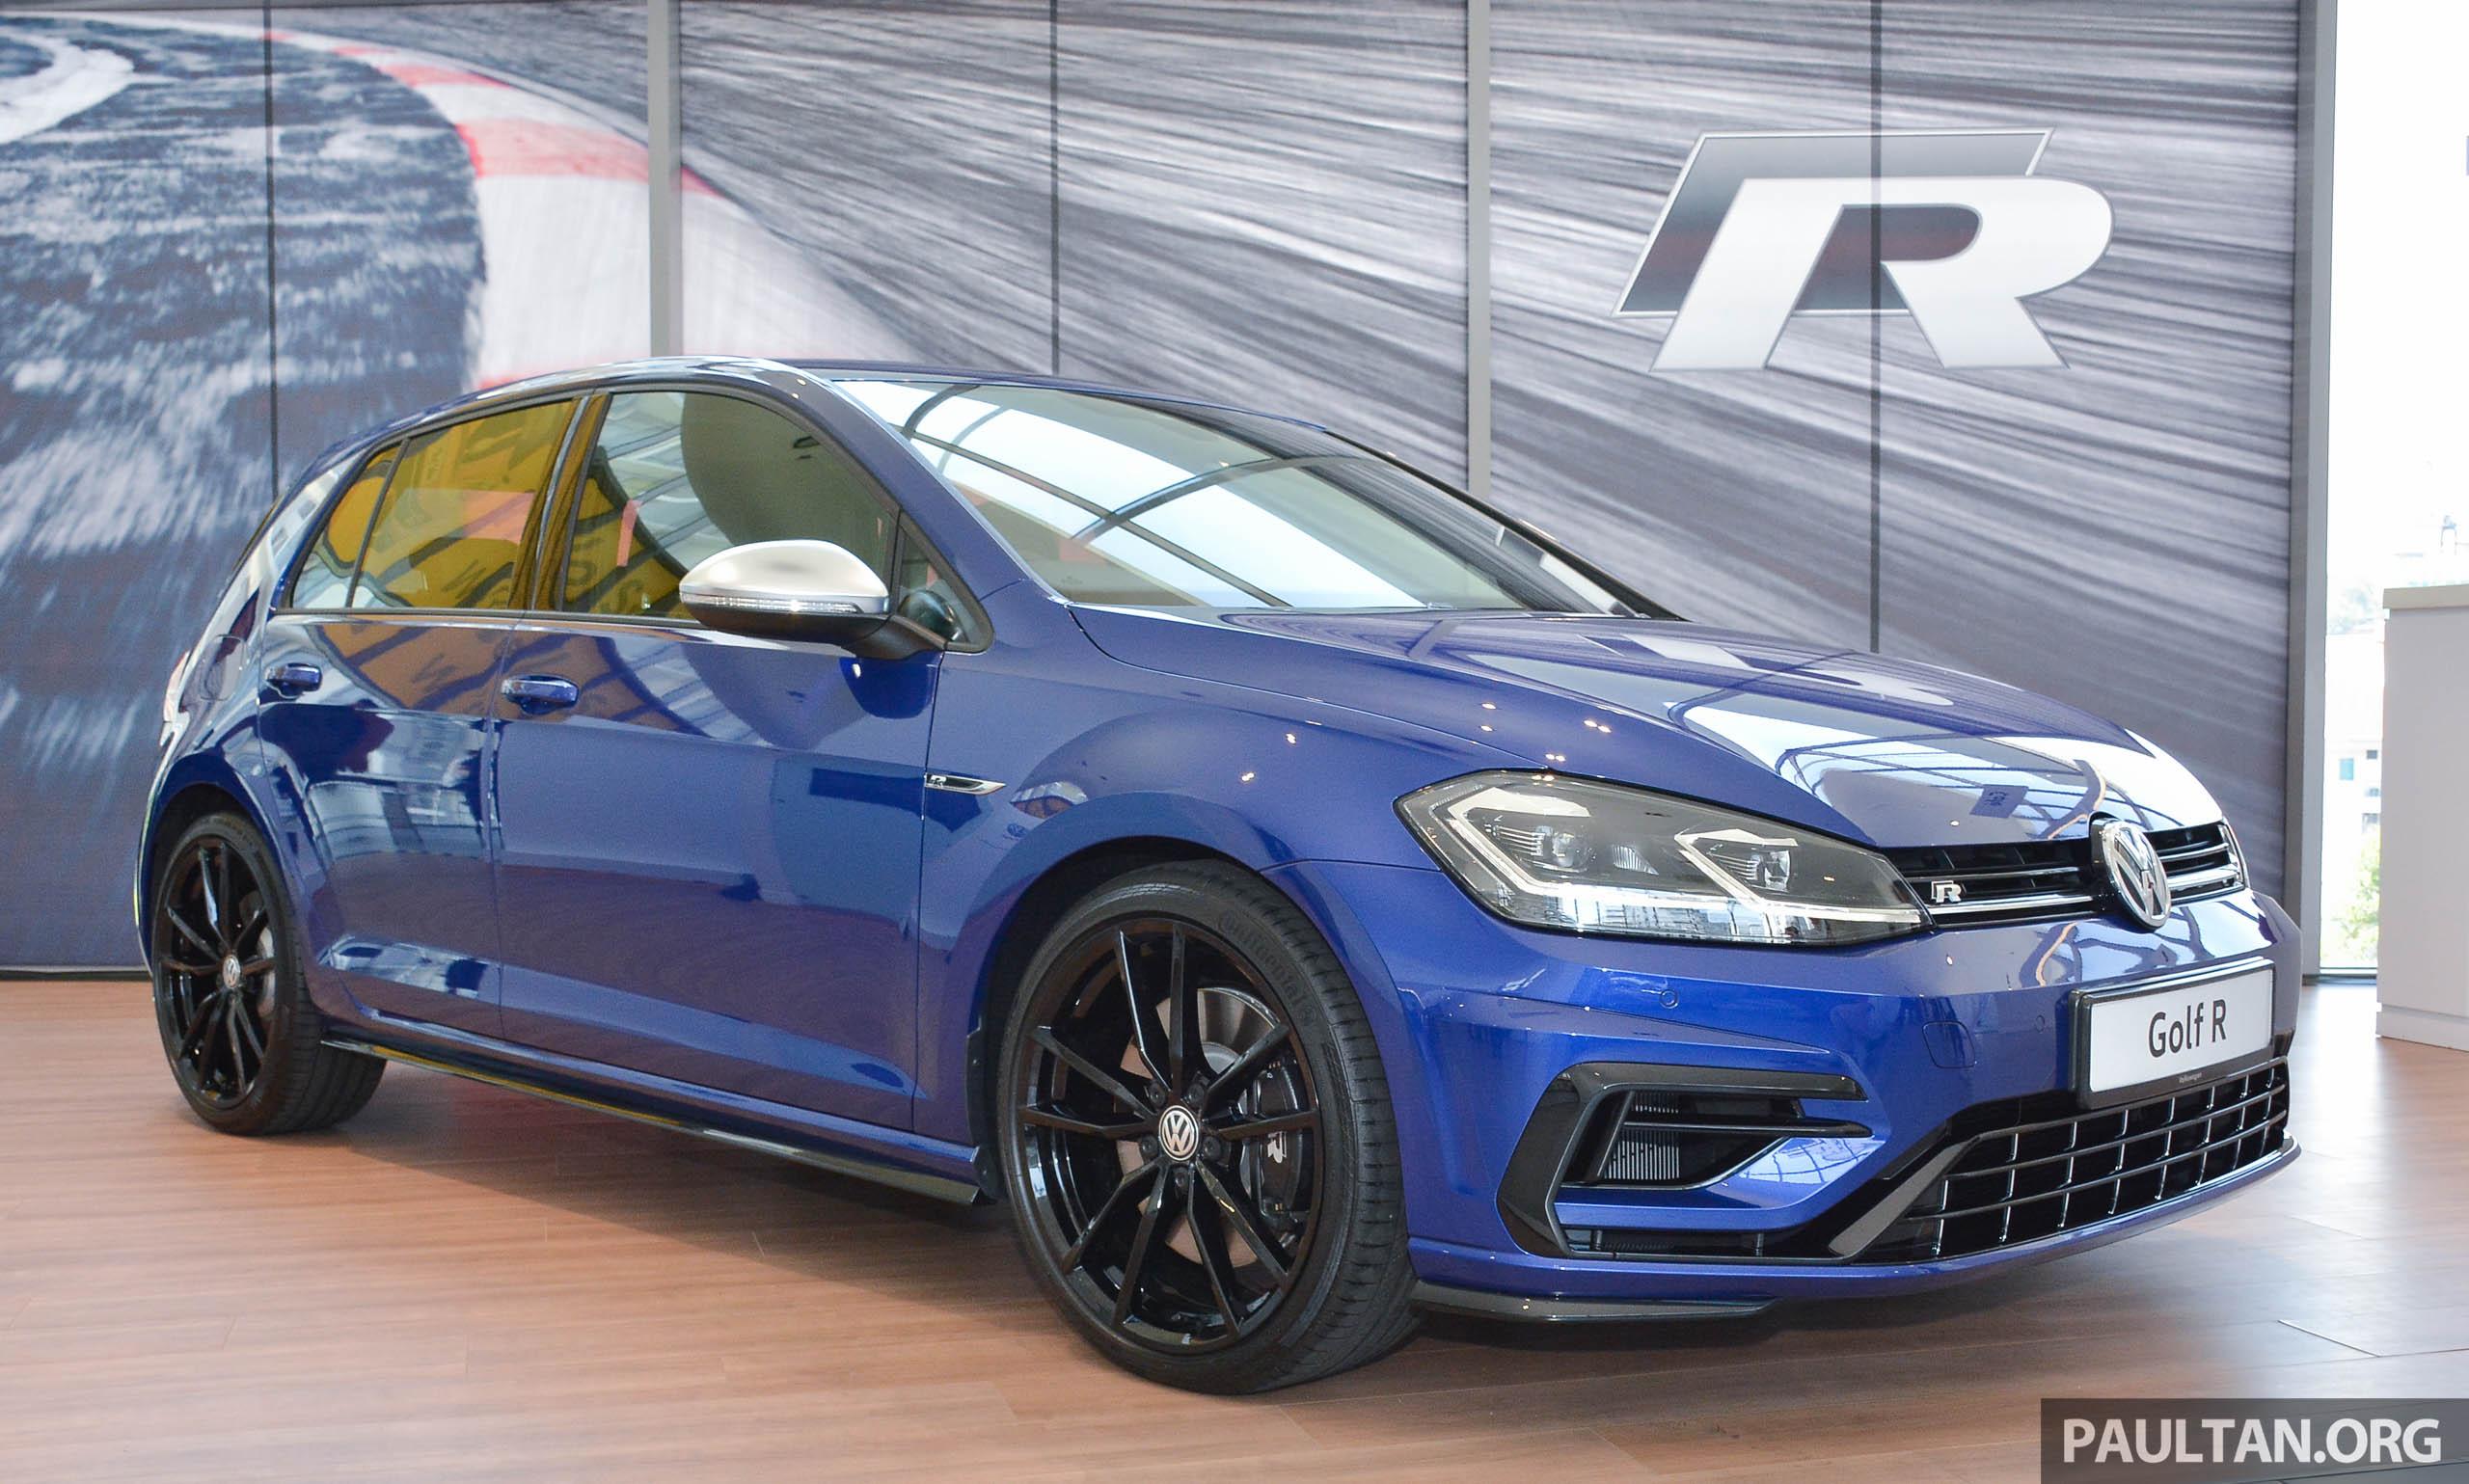 2018 Volkswagen Golf R Debuts In Malaysia Rm296k Paultan Org